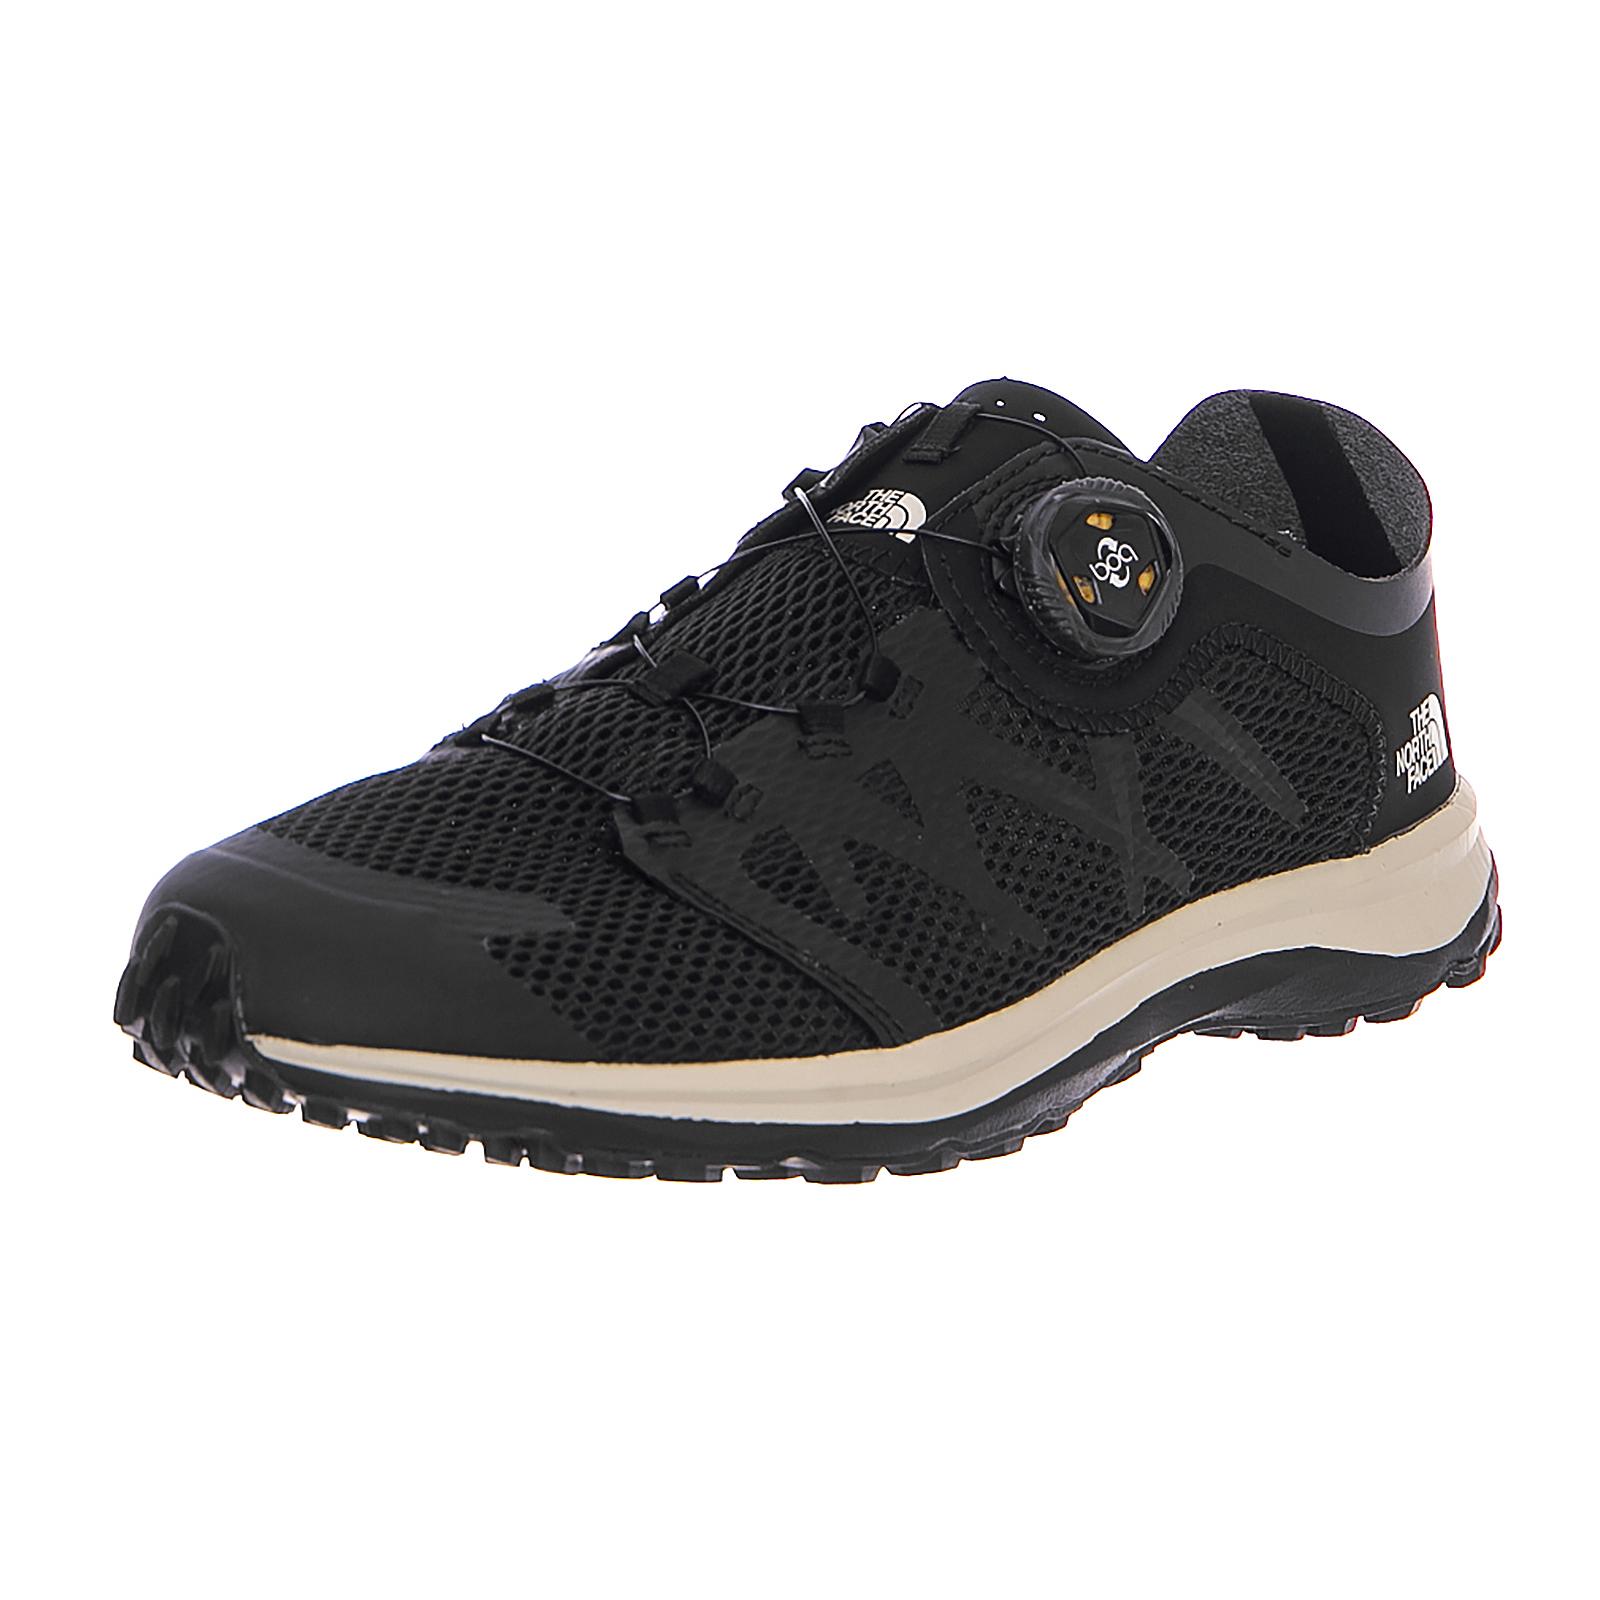 Zapatos casuales salvajes The North Face Zapatillas M Litewave Flow Boa Tnfblk/Vntagwht Negro